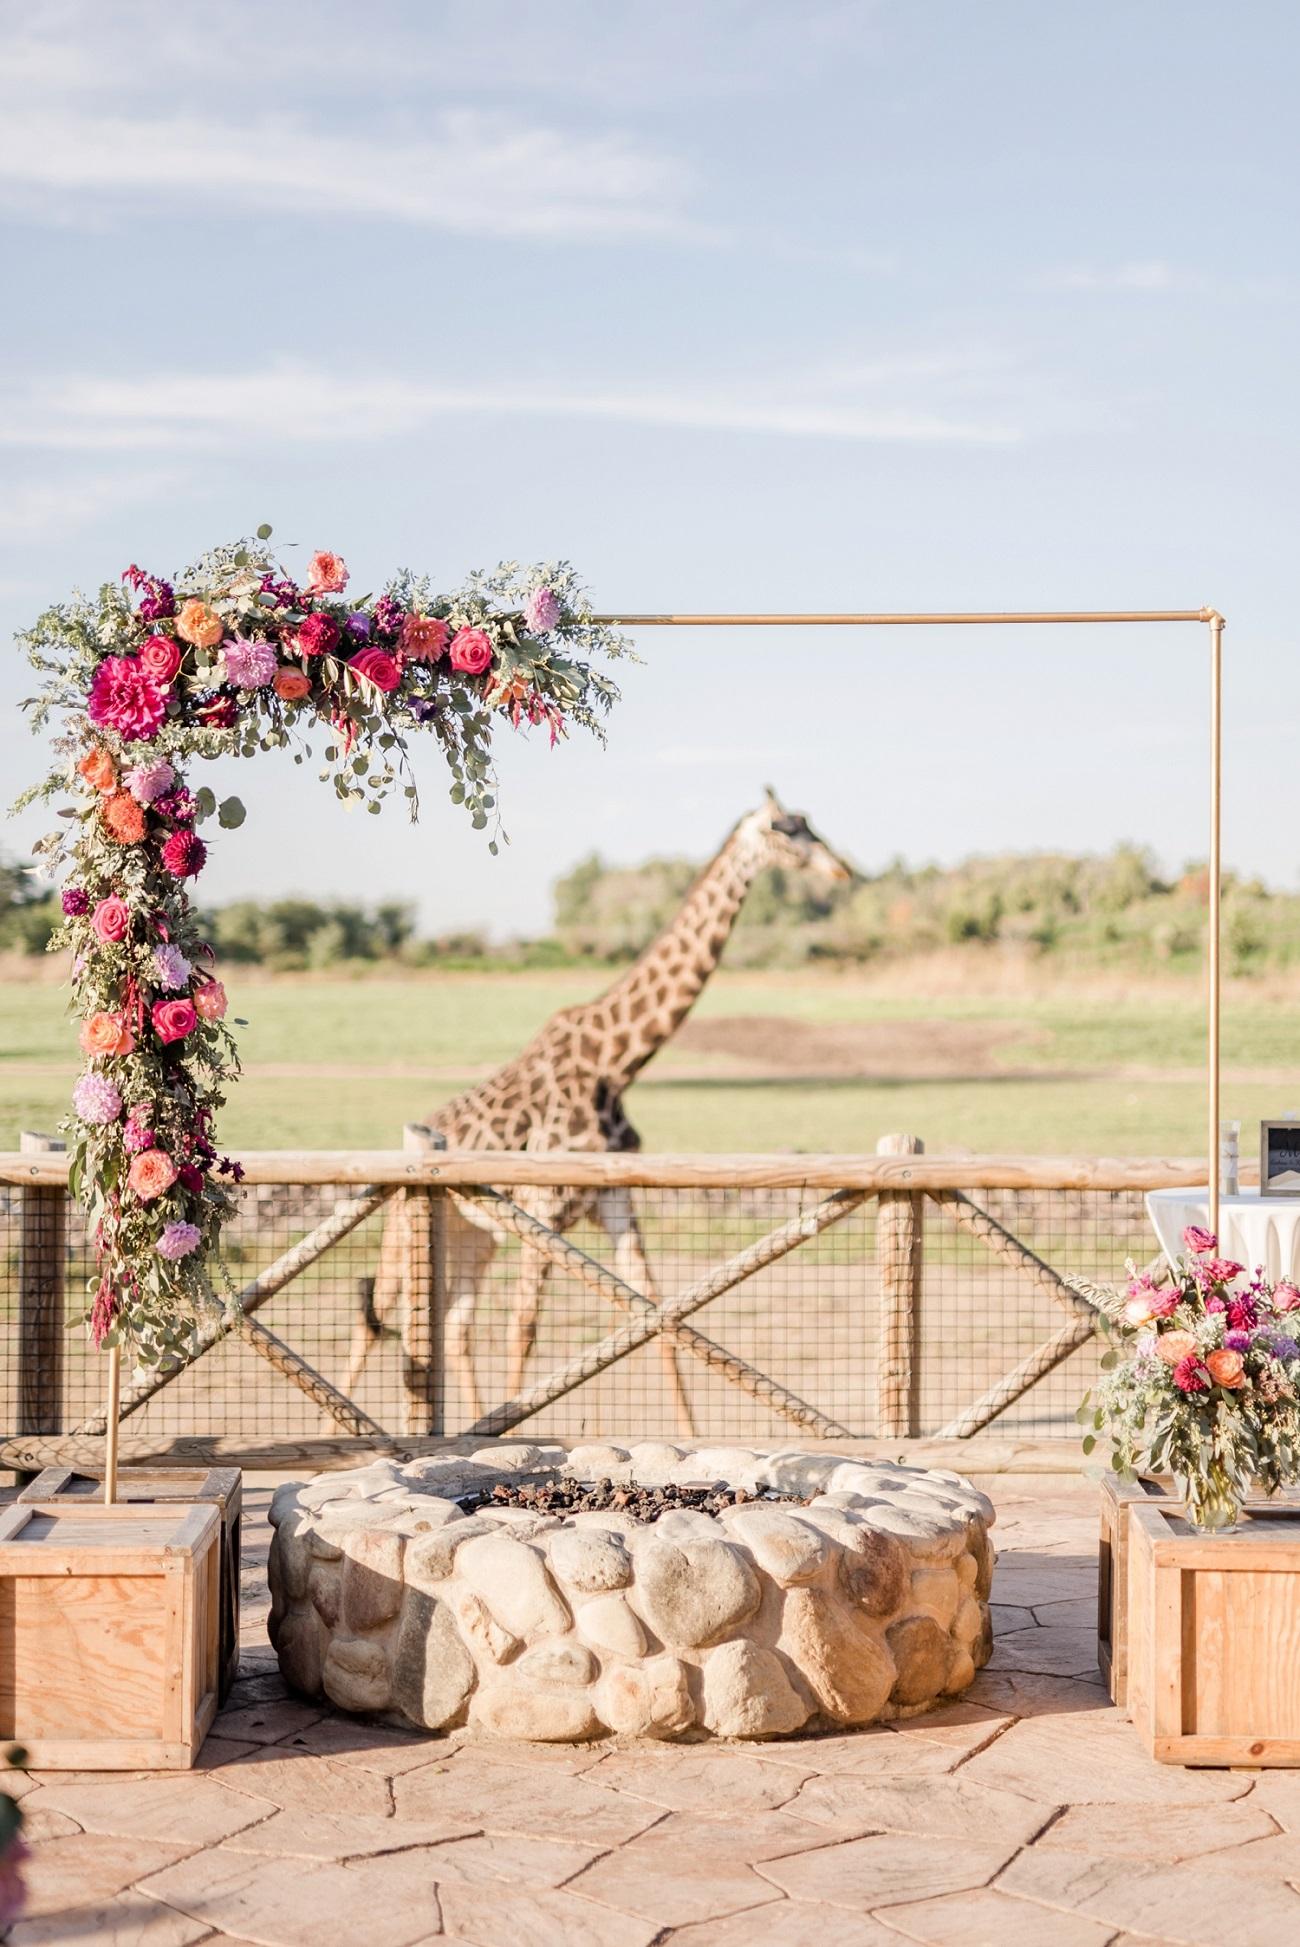 Giraffe op trouwlocatie